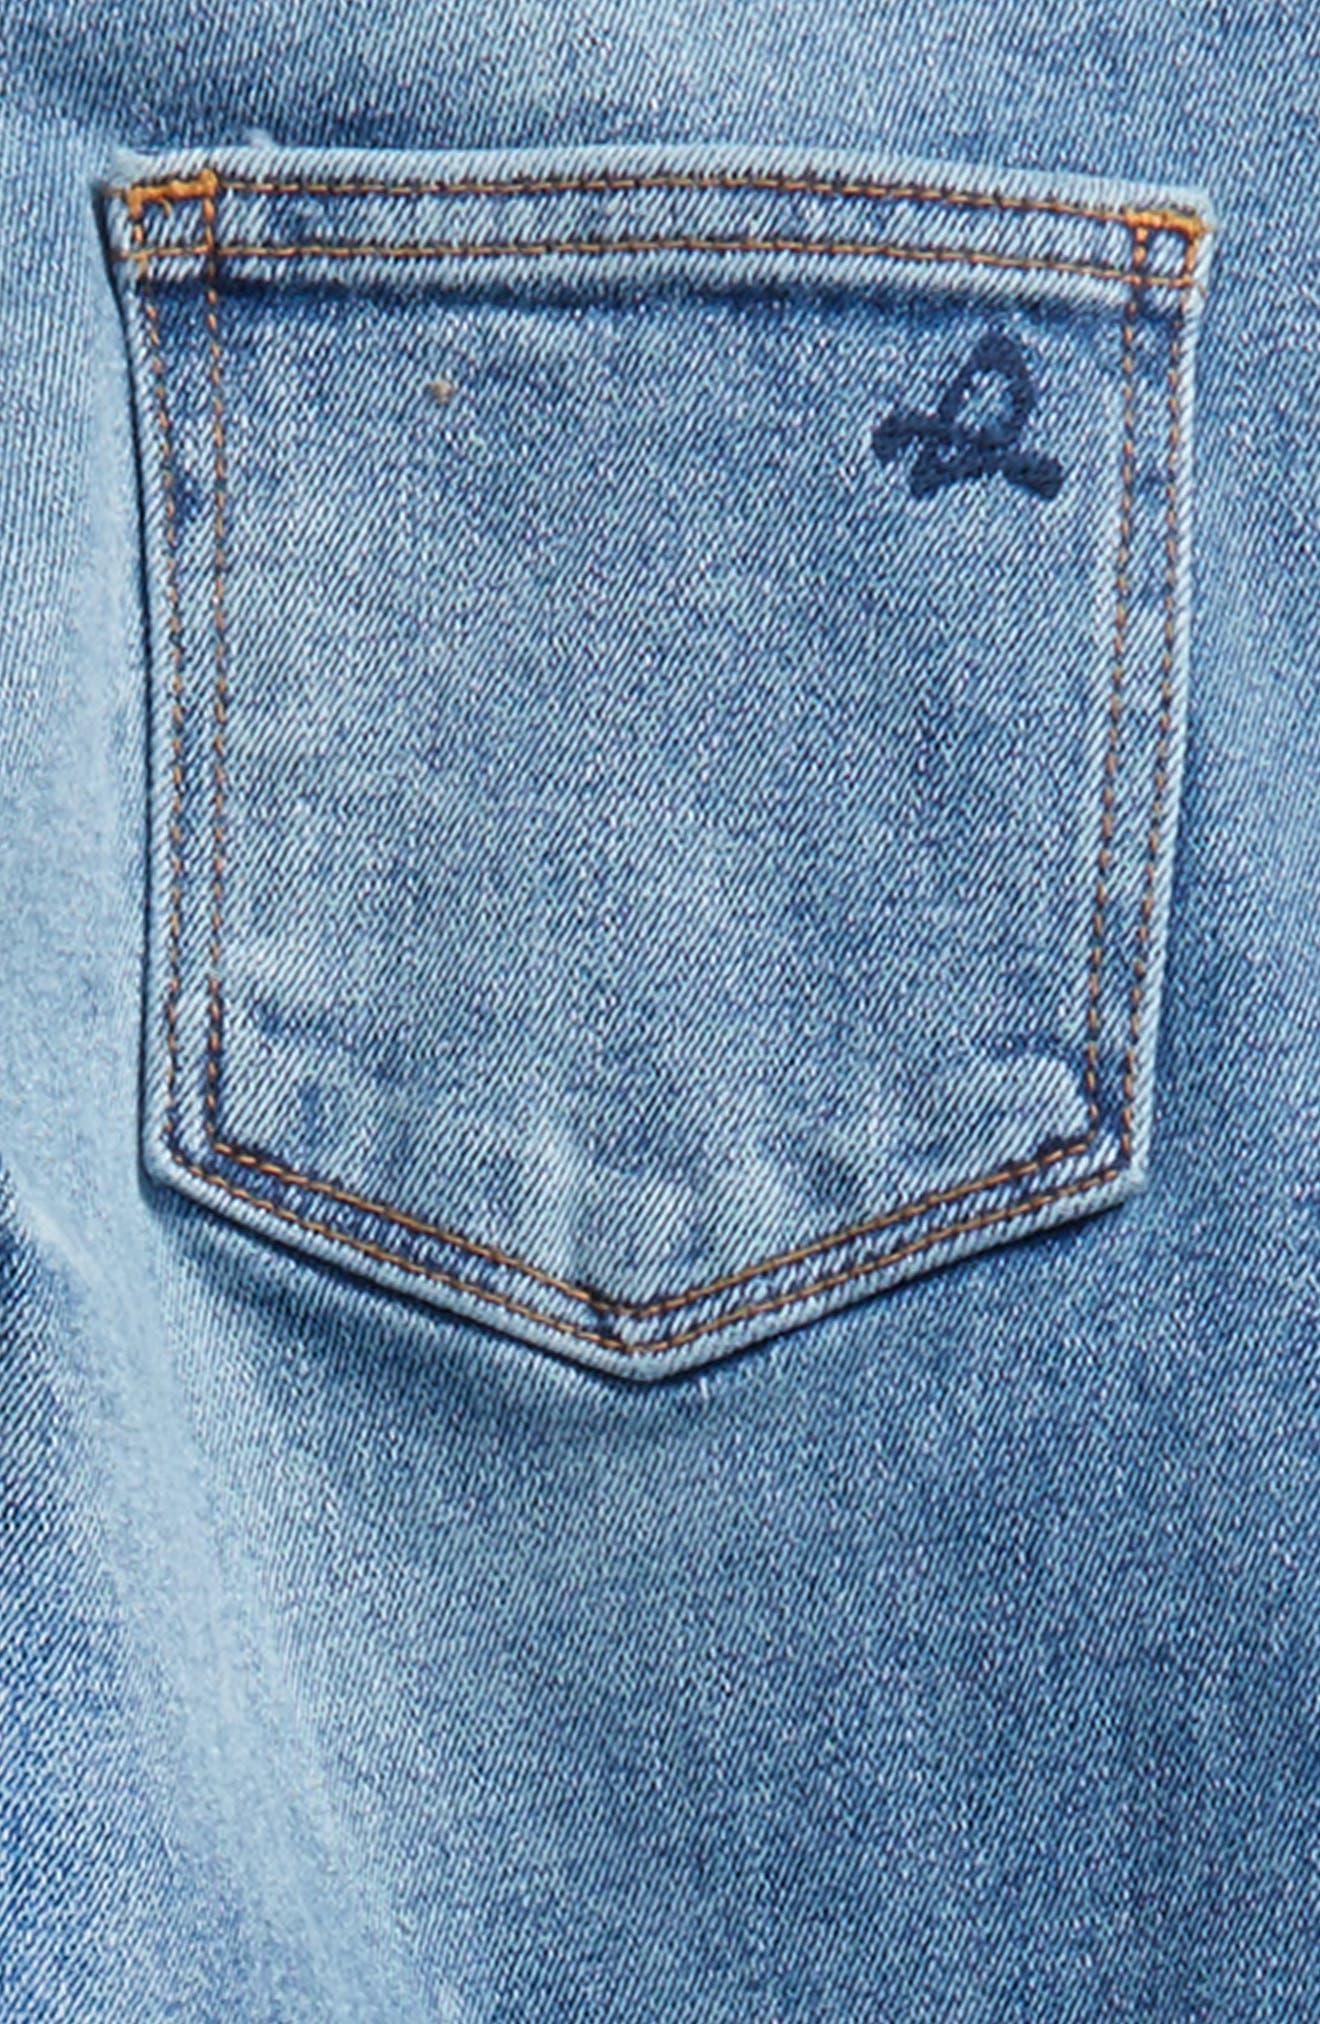 Brady Slim Fit Jeans,                             Alternate thumbnail 3, color,                             BREATHE